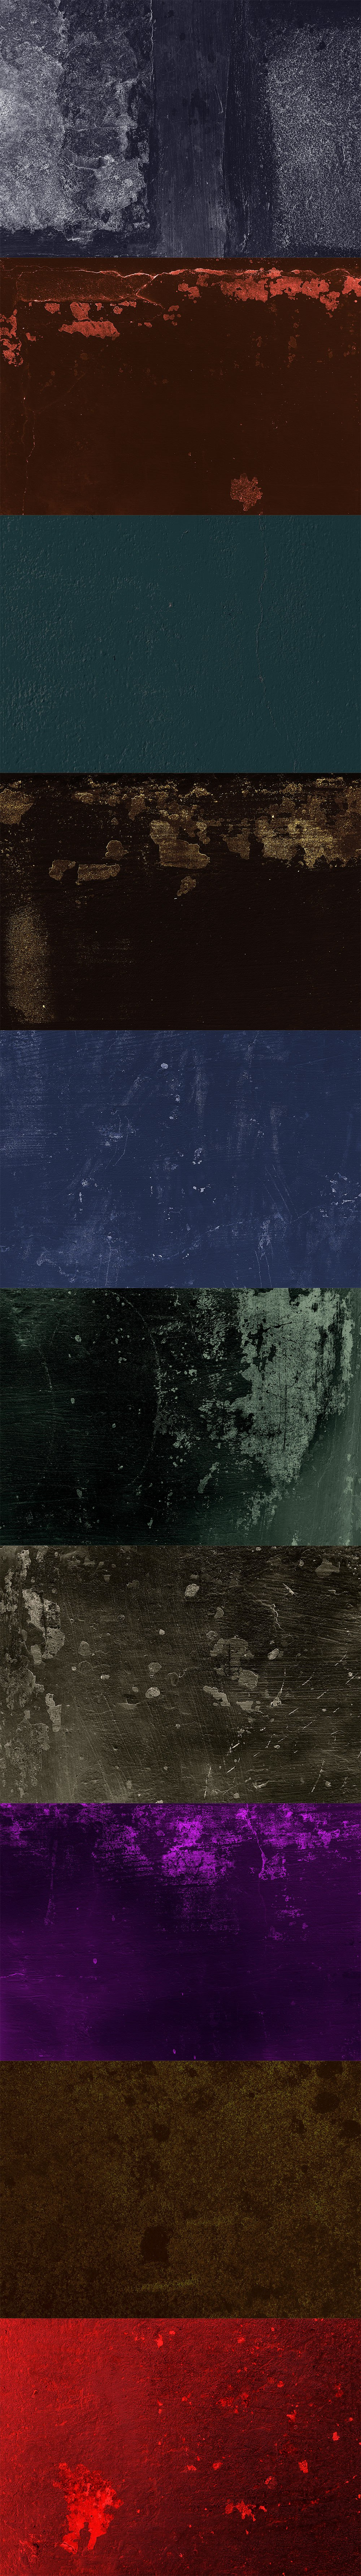 Яркие гранж-текстуры